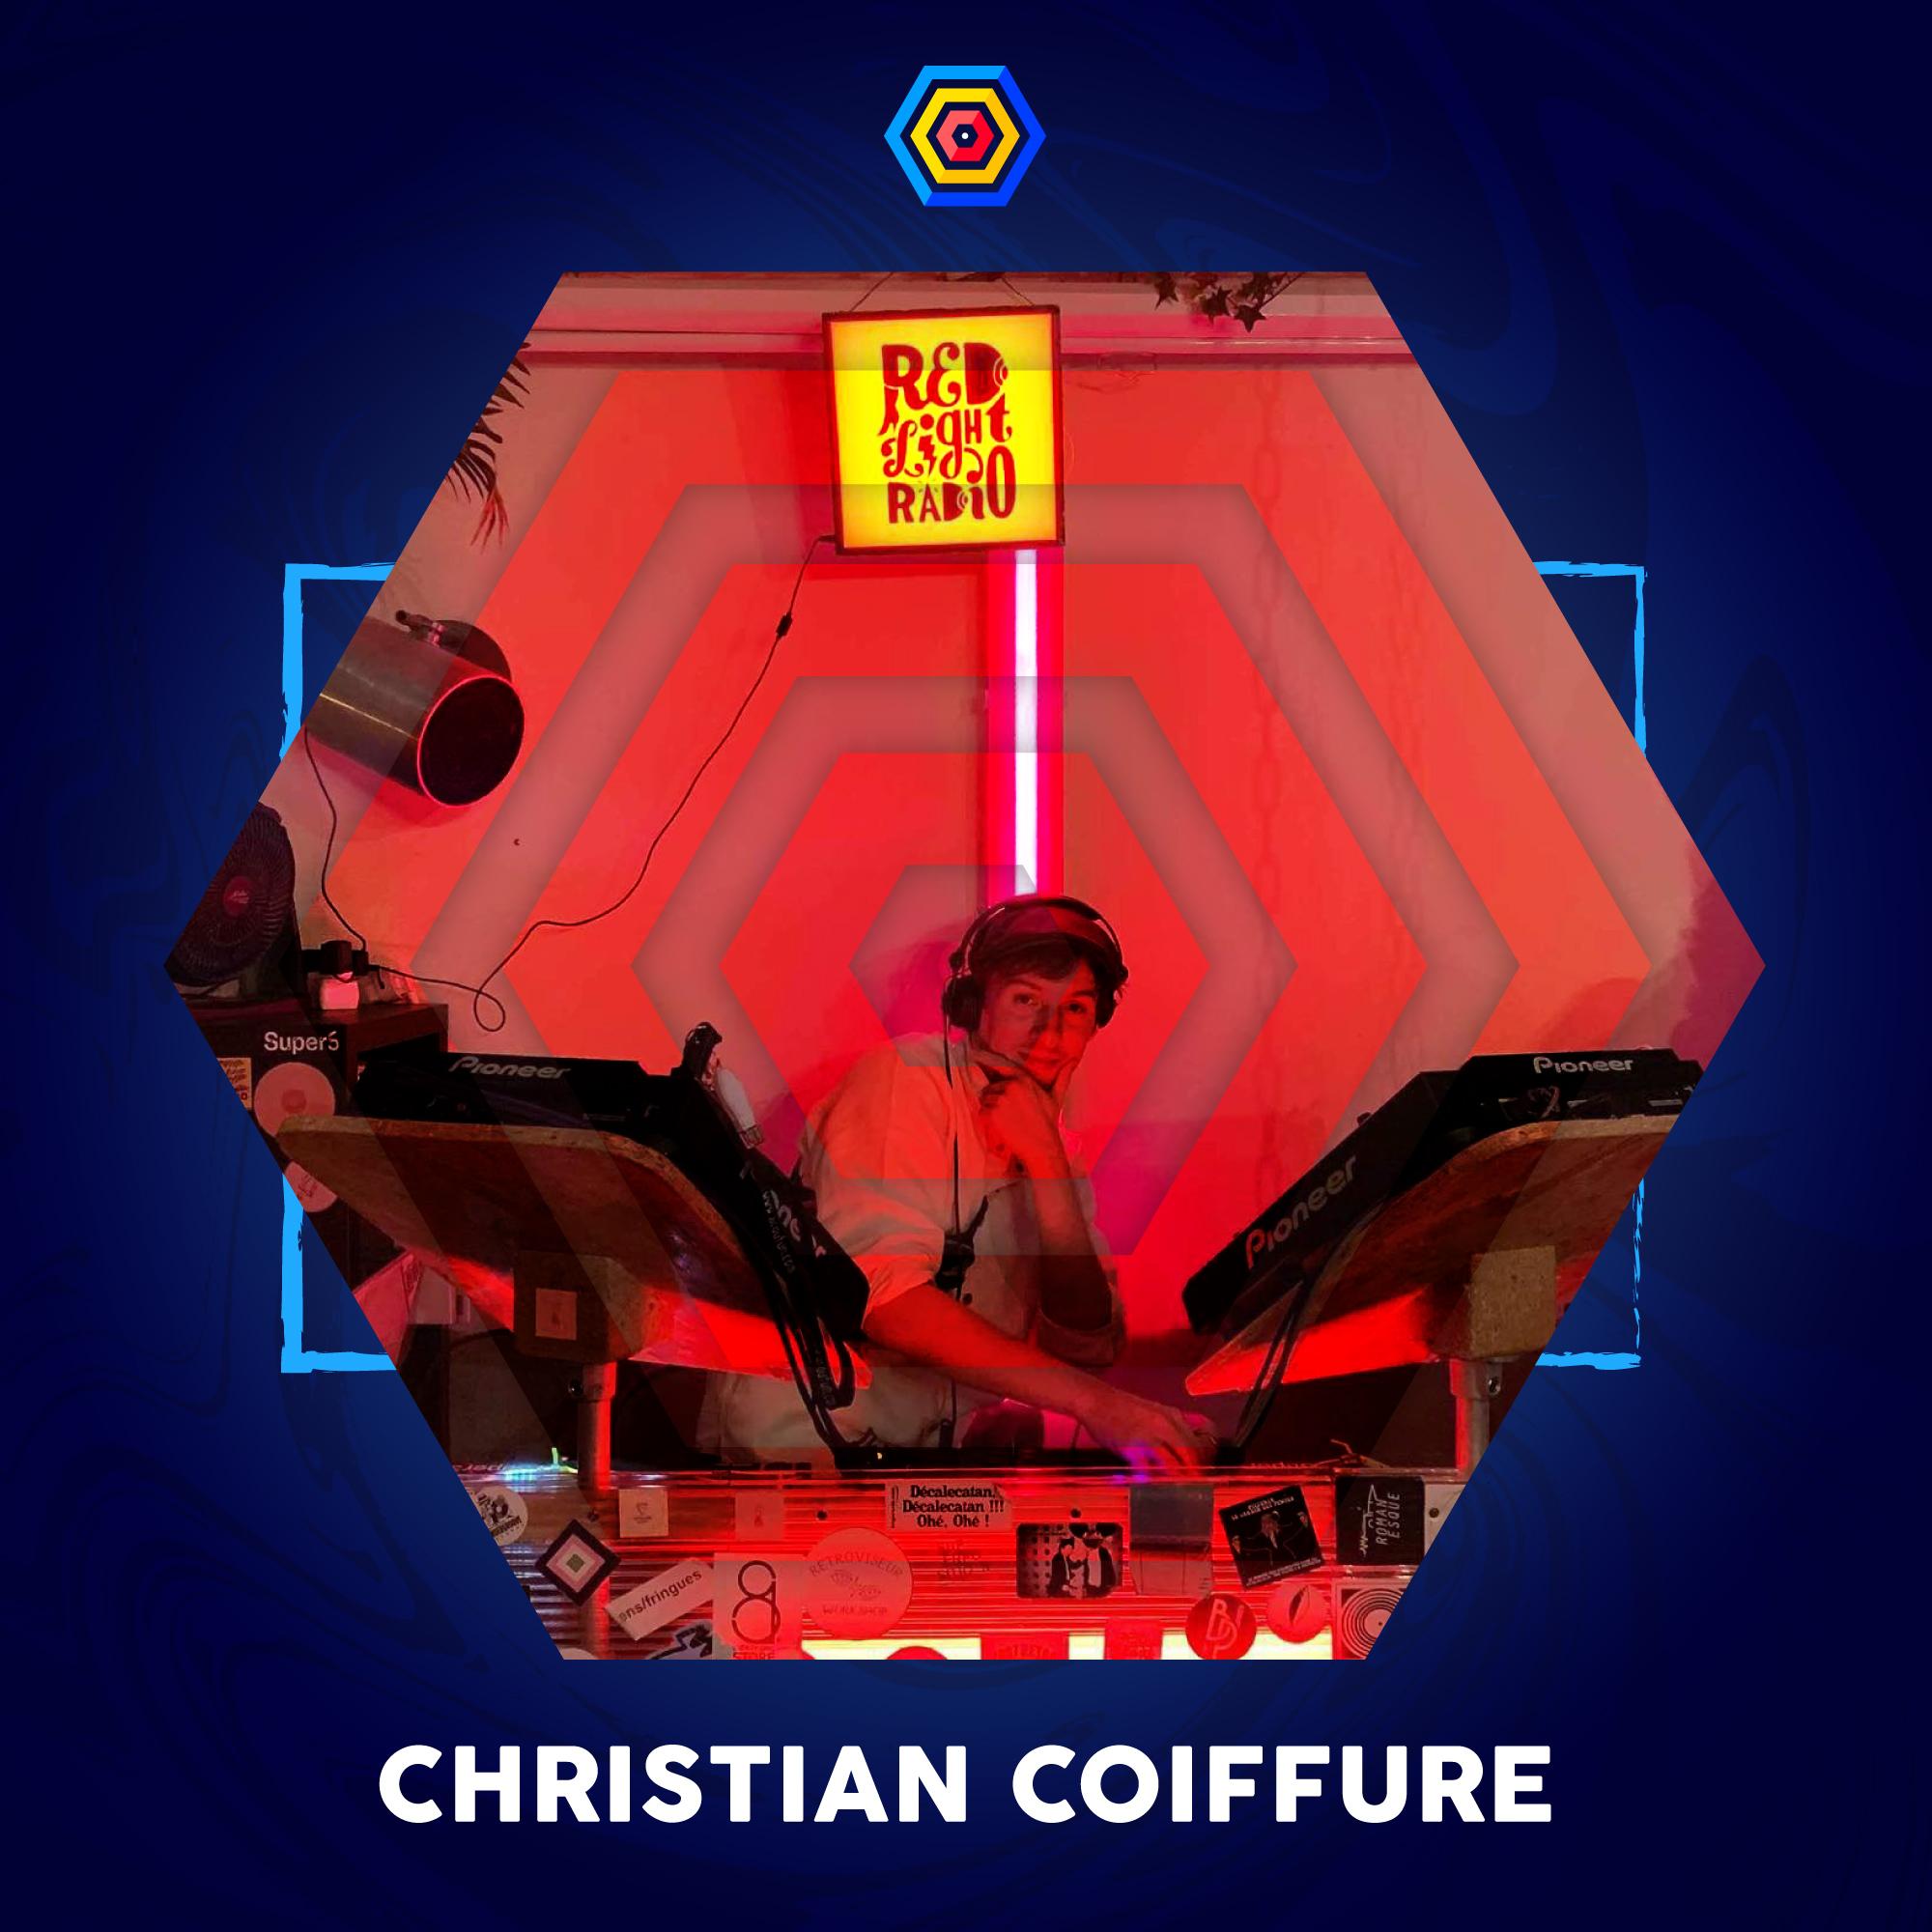 Christian Coiffure